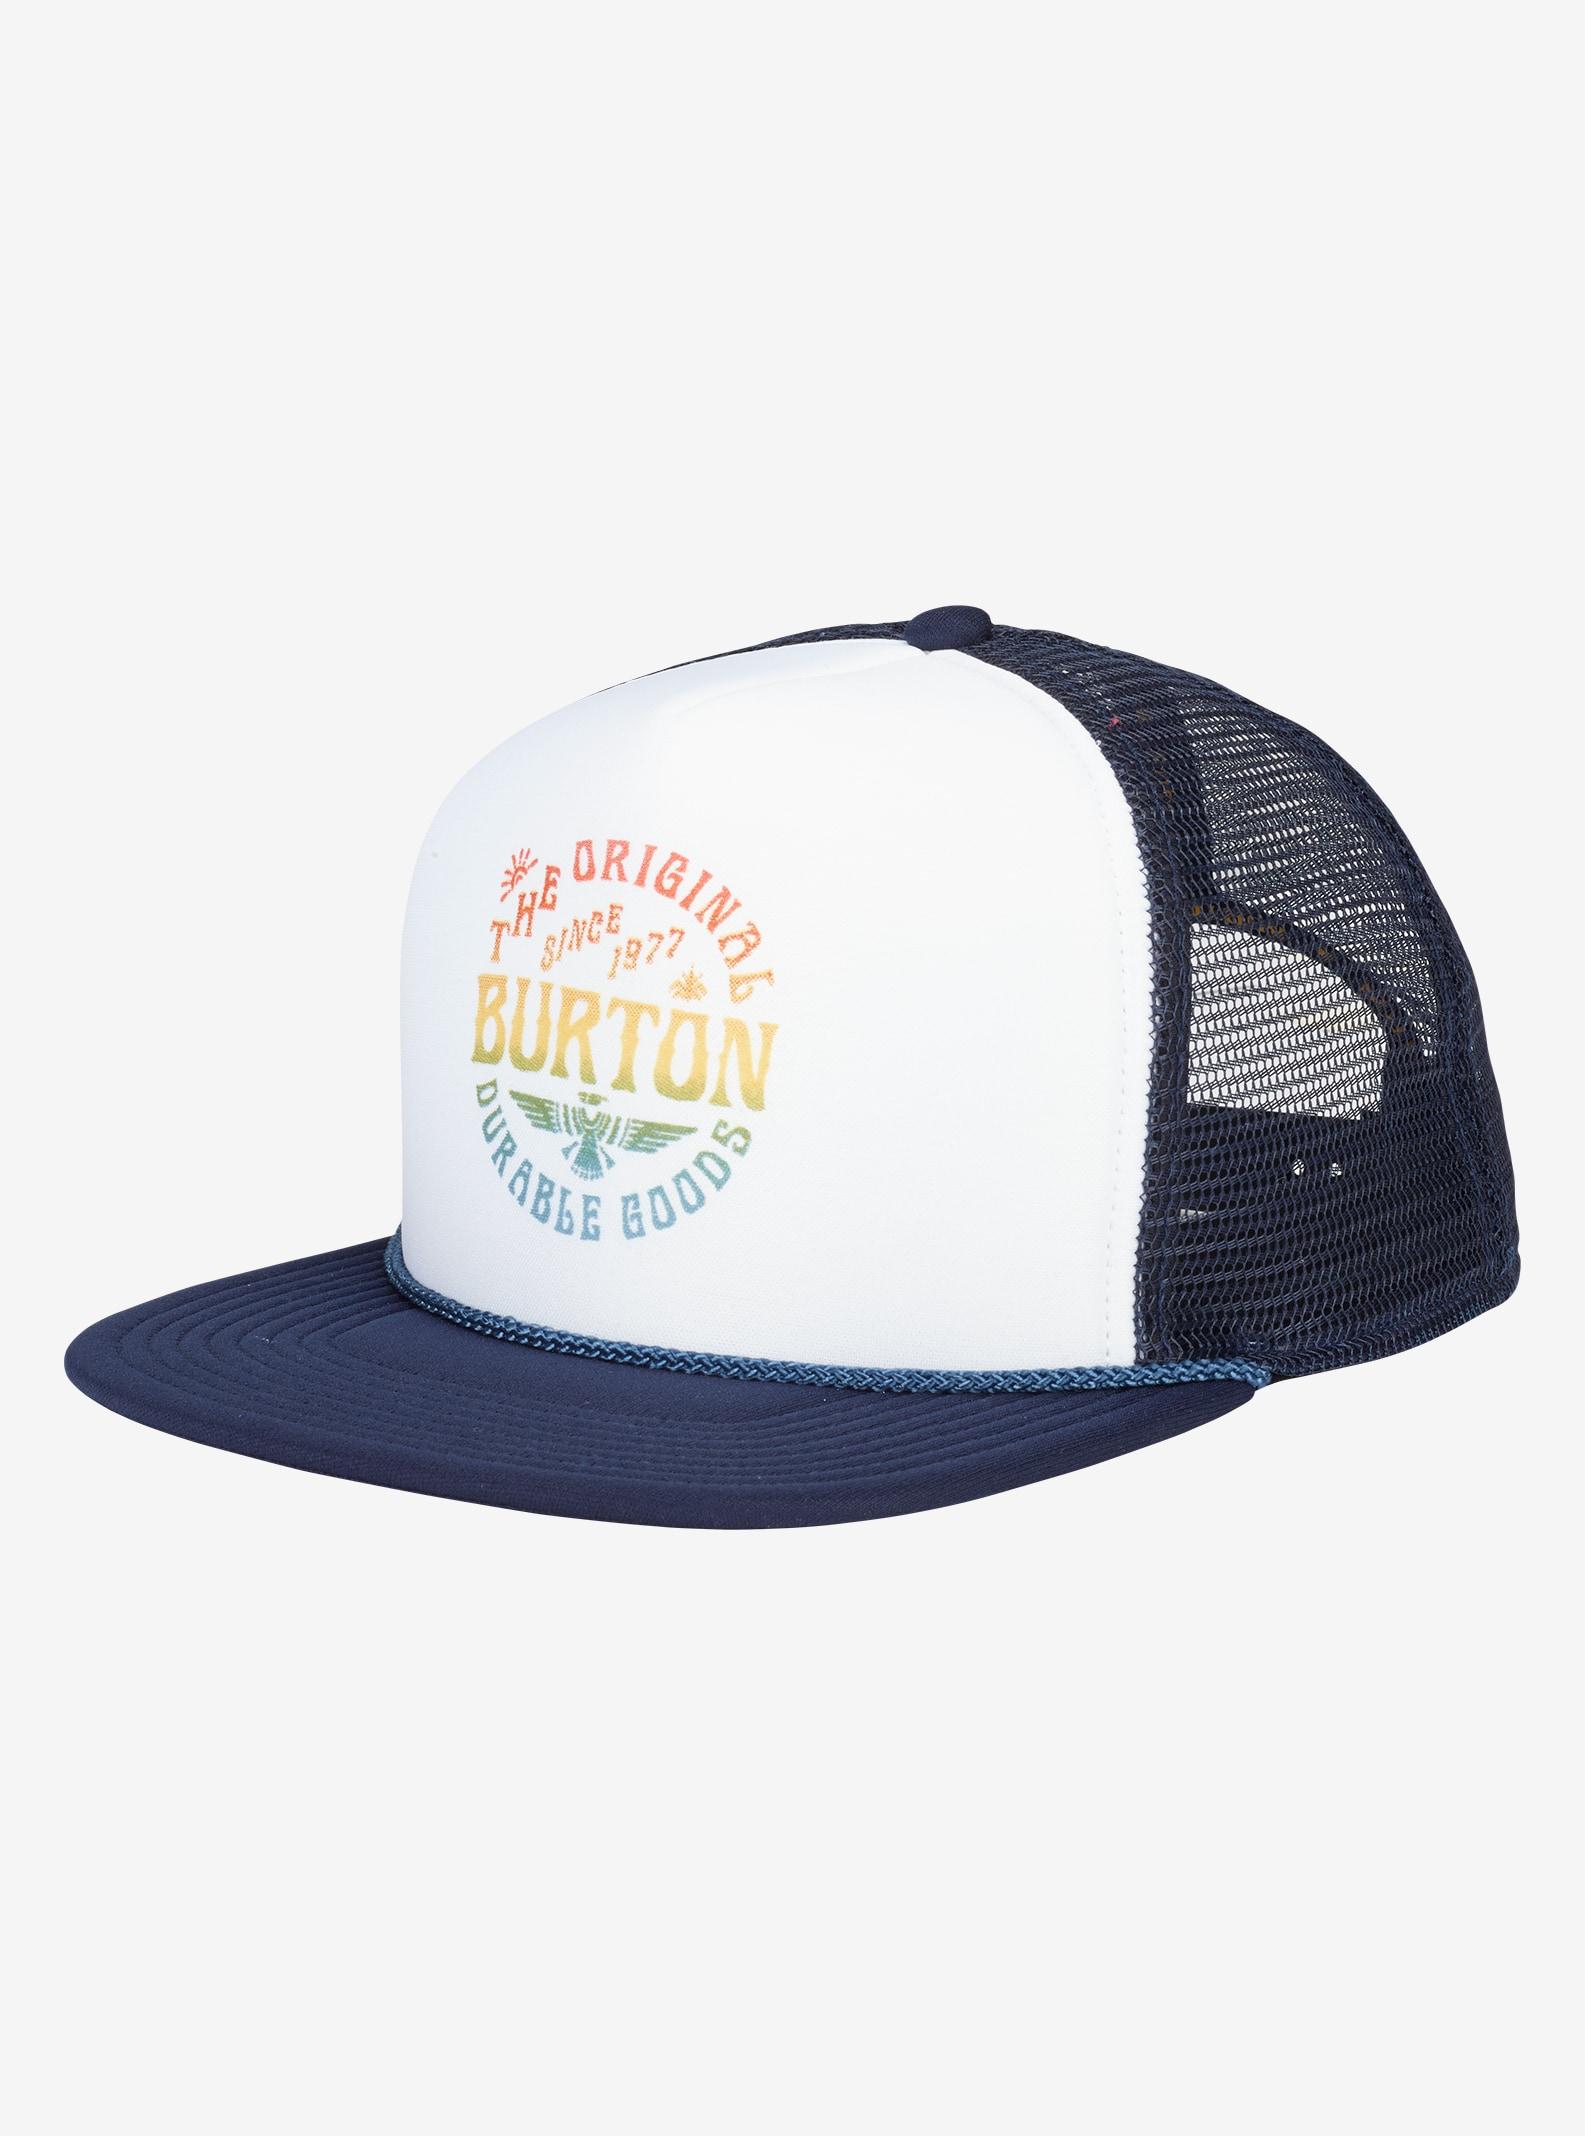 Burton I-80 Snapback Trucker Hat shown in Indigo